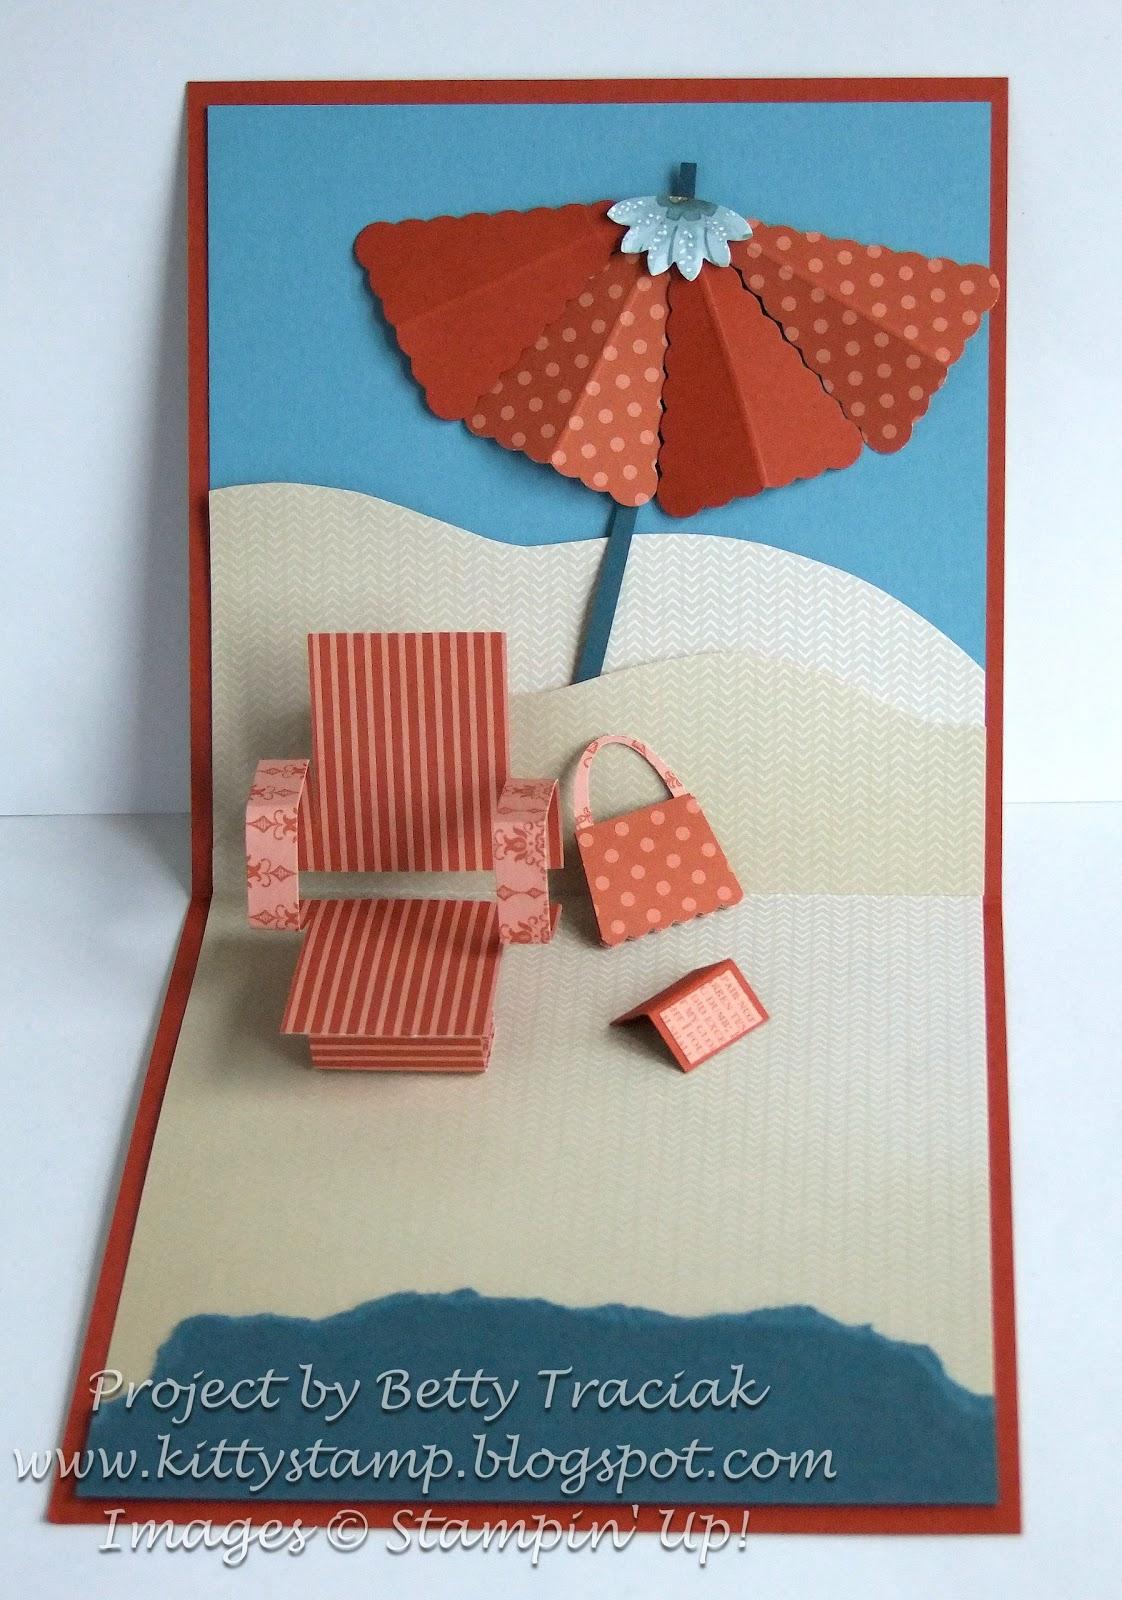 Pop Up Chair Nichols Stone Rocking Value Kitty Stamp Peekaboo Frame Beach Tutorial